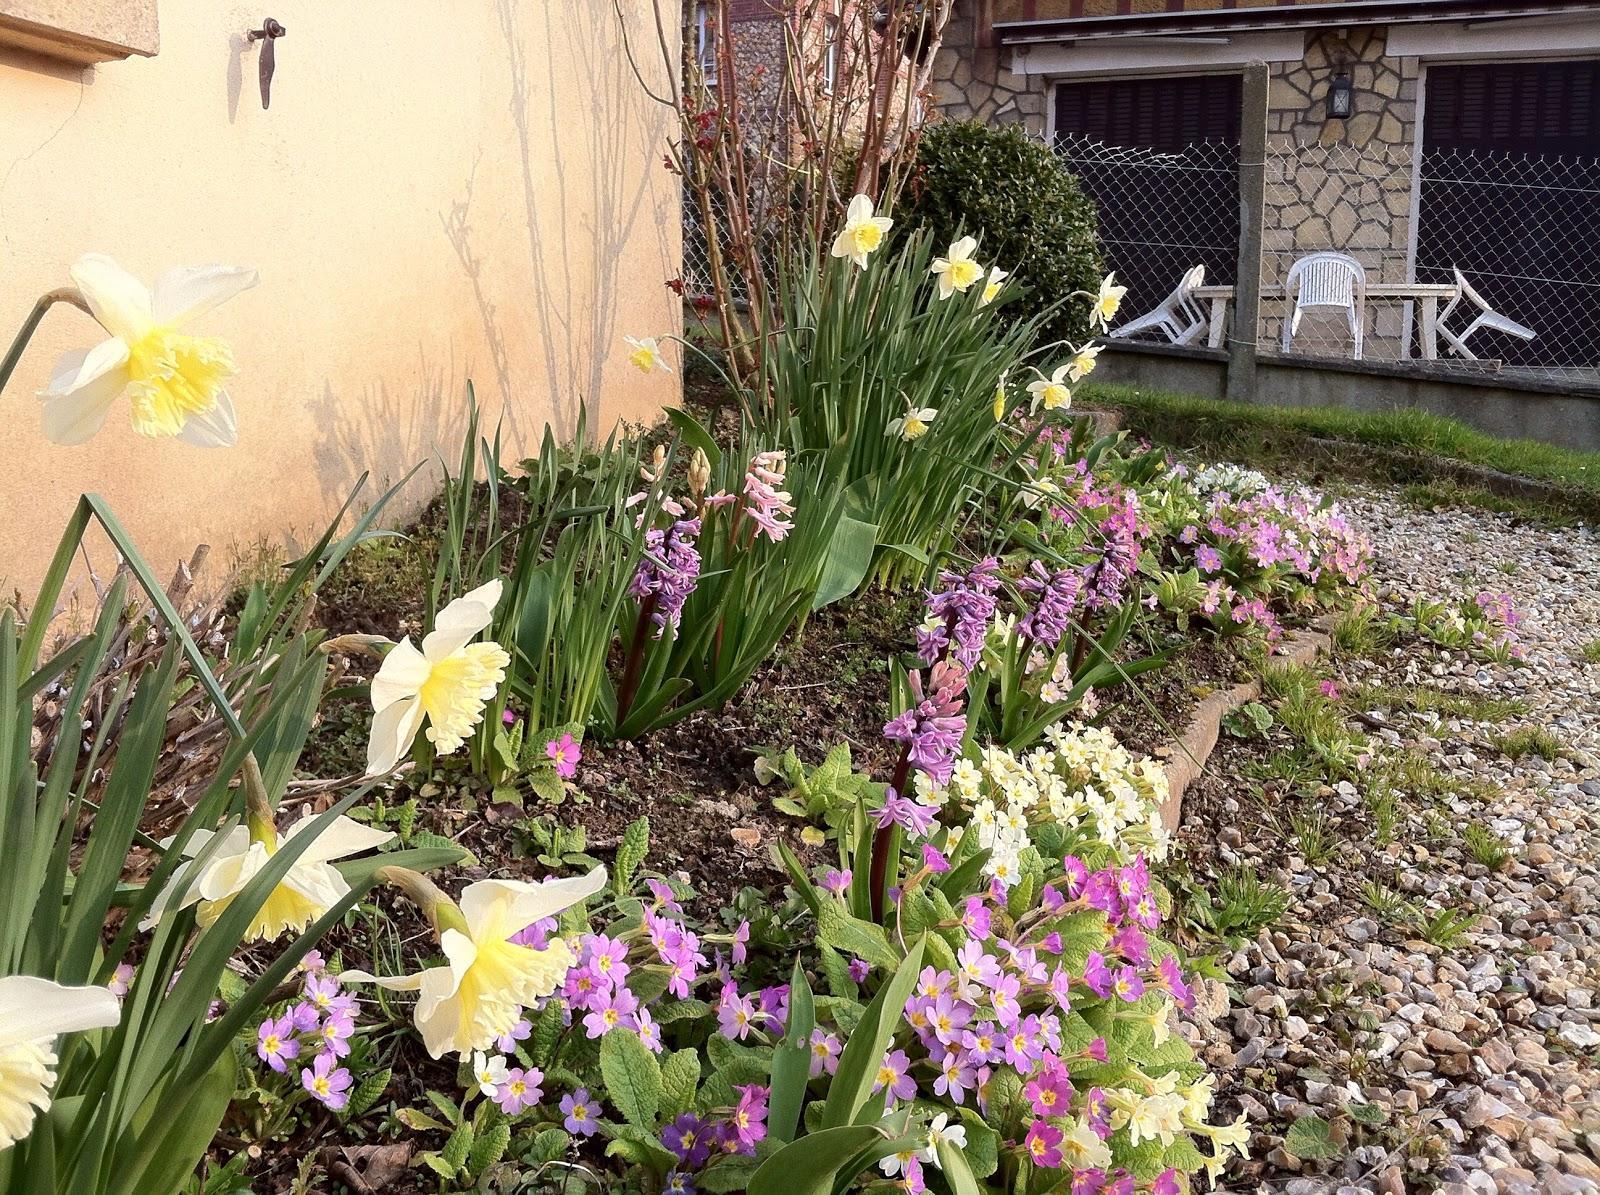 Mon jardin imparfait mars 2013 for Le jardin imparfait